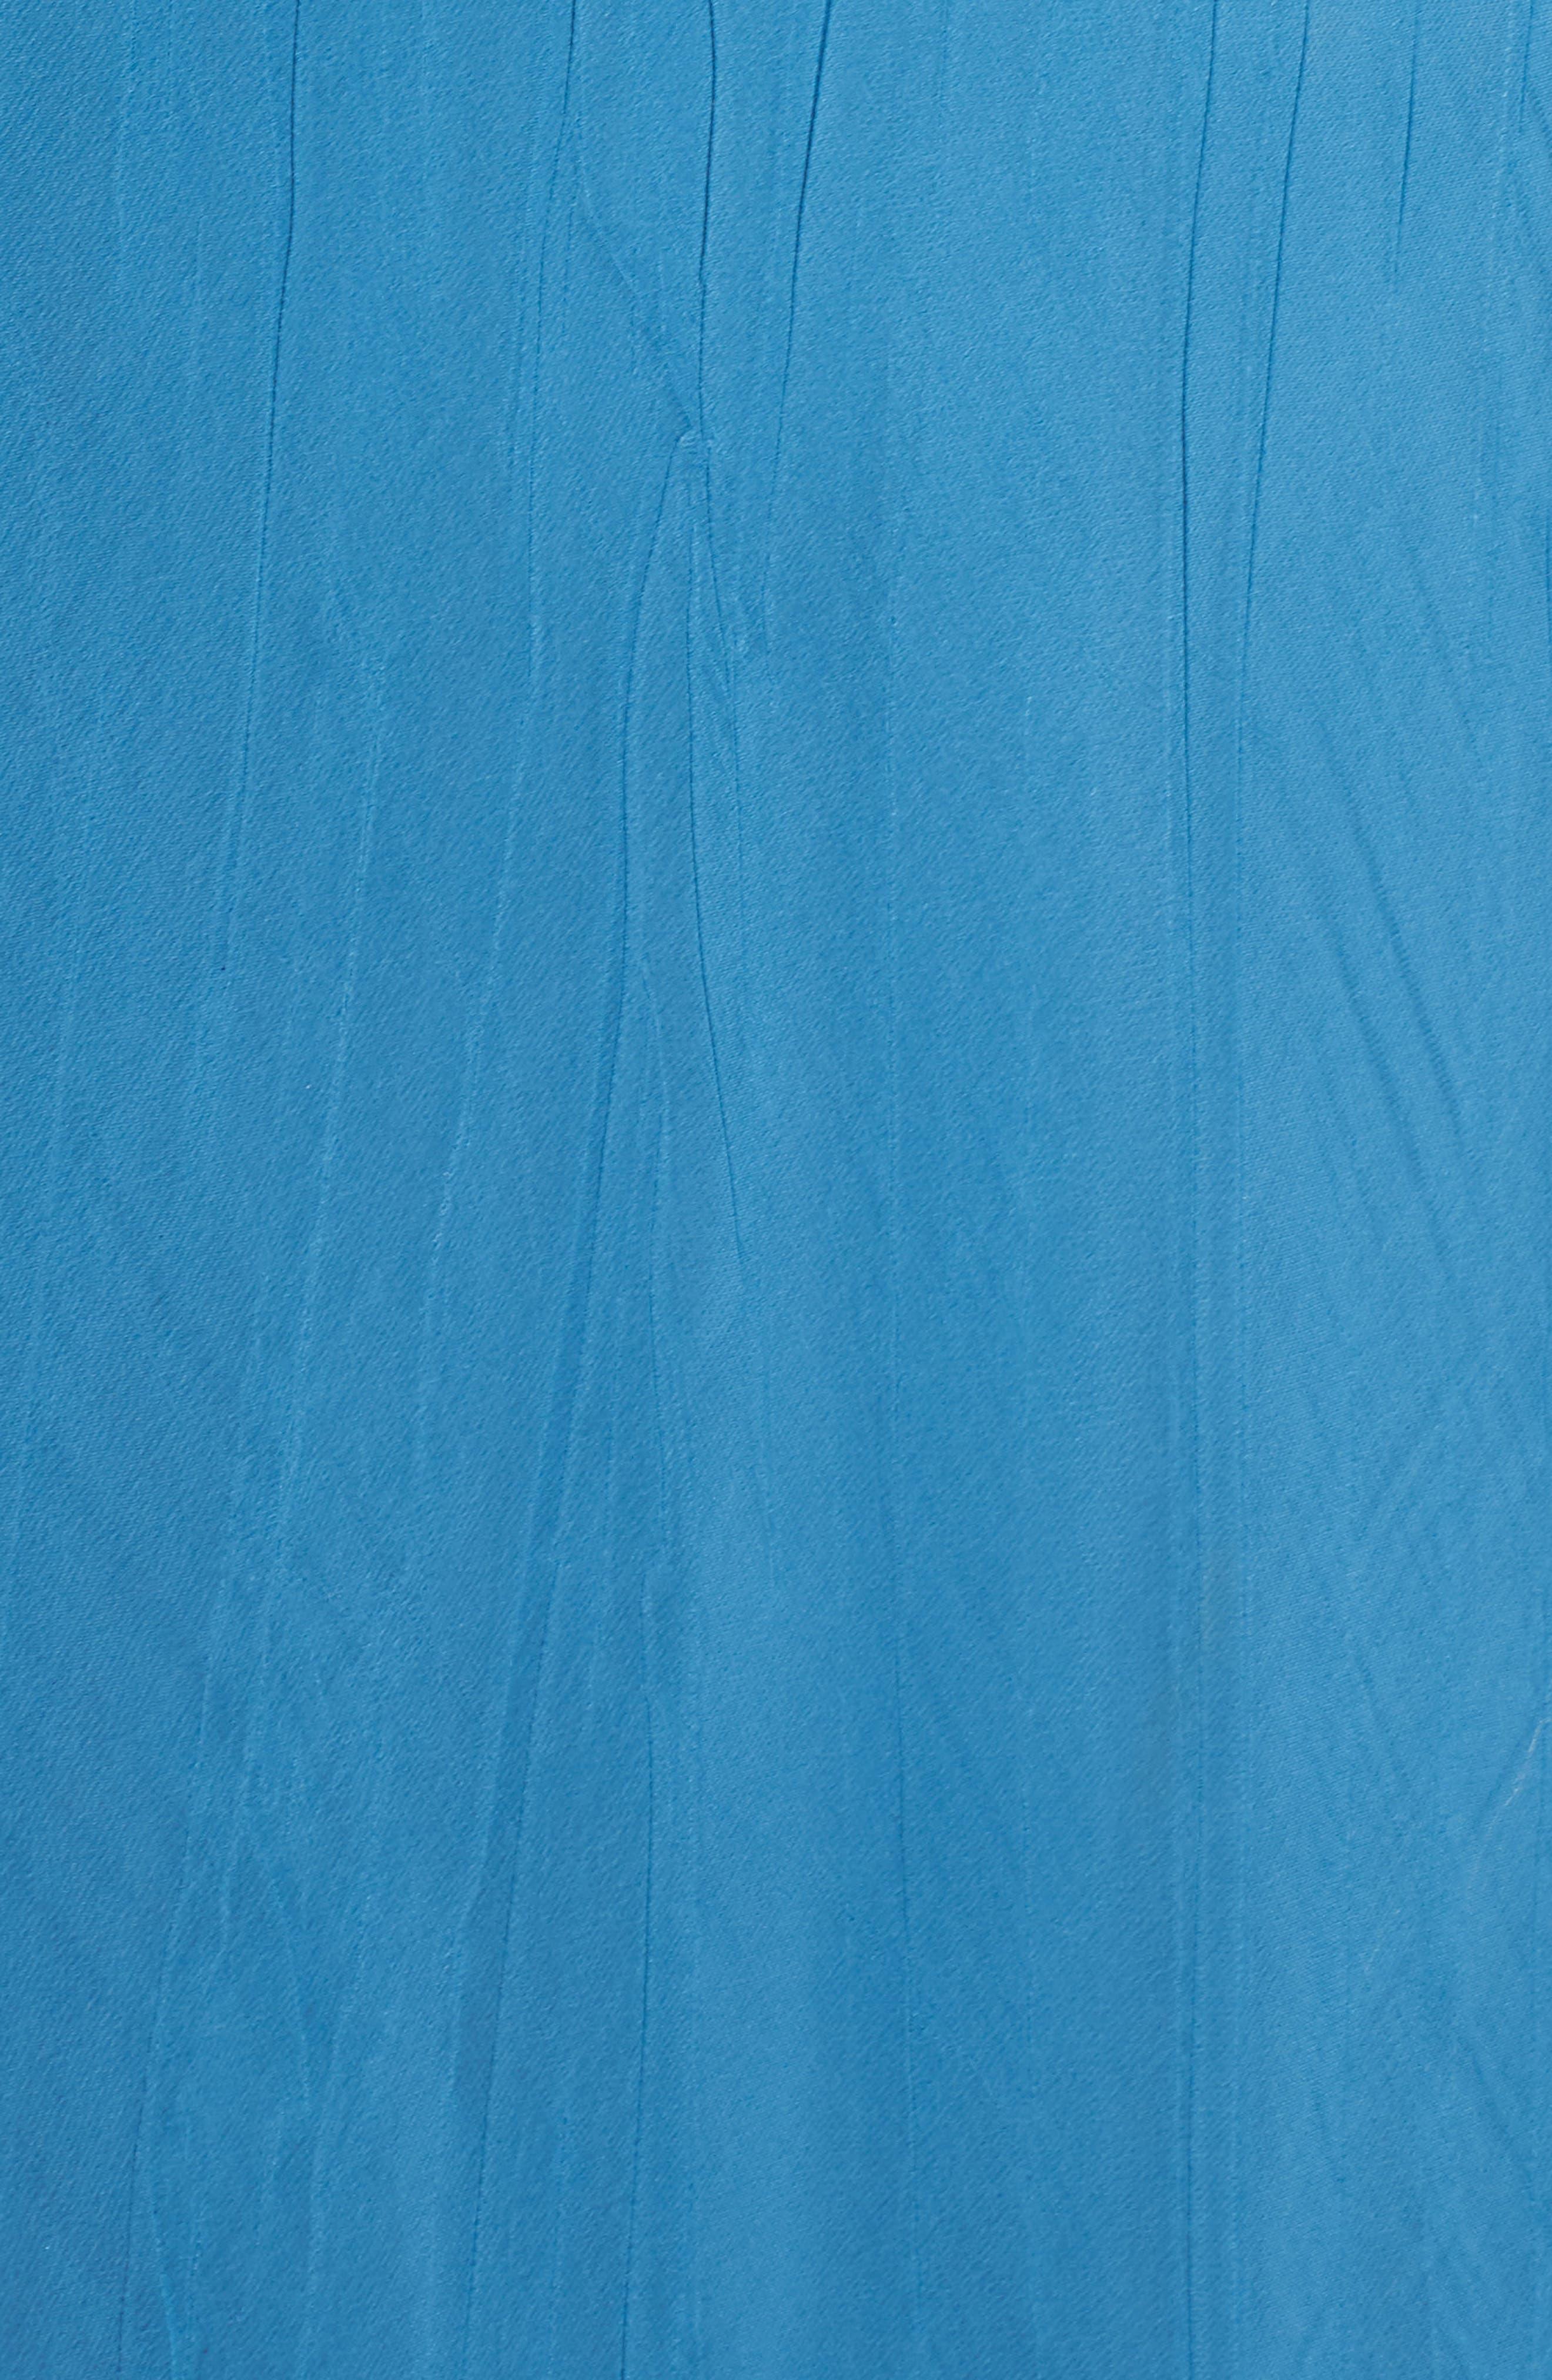 Beaded Neck Asymmetrical Charmeuse A-Line Dress,                             Alternate thumbnail 5, color,                             Blue Dusk Night Ombre